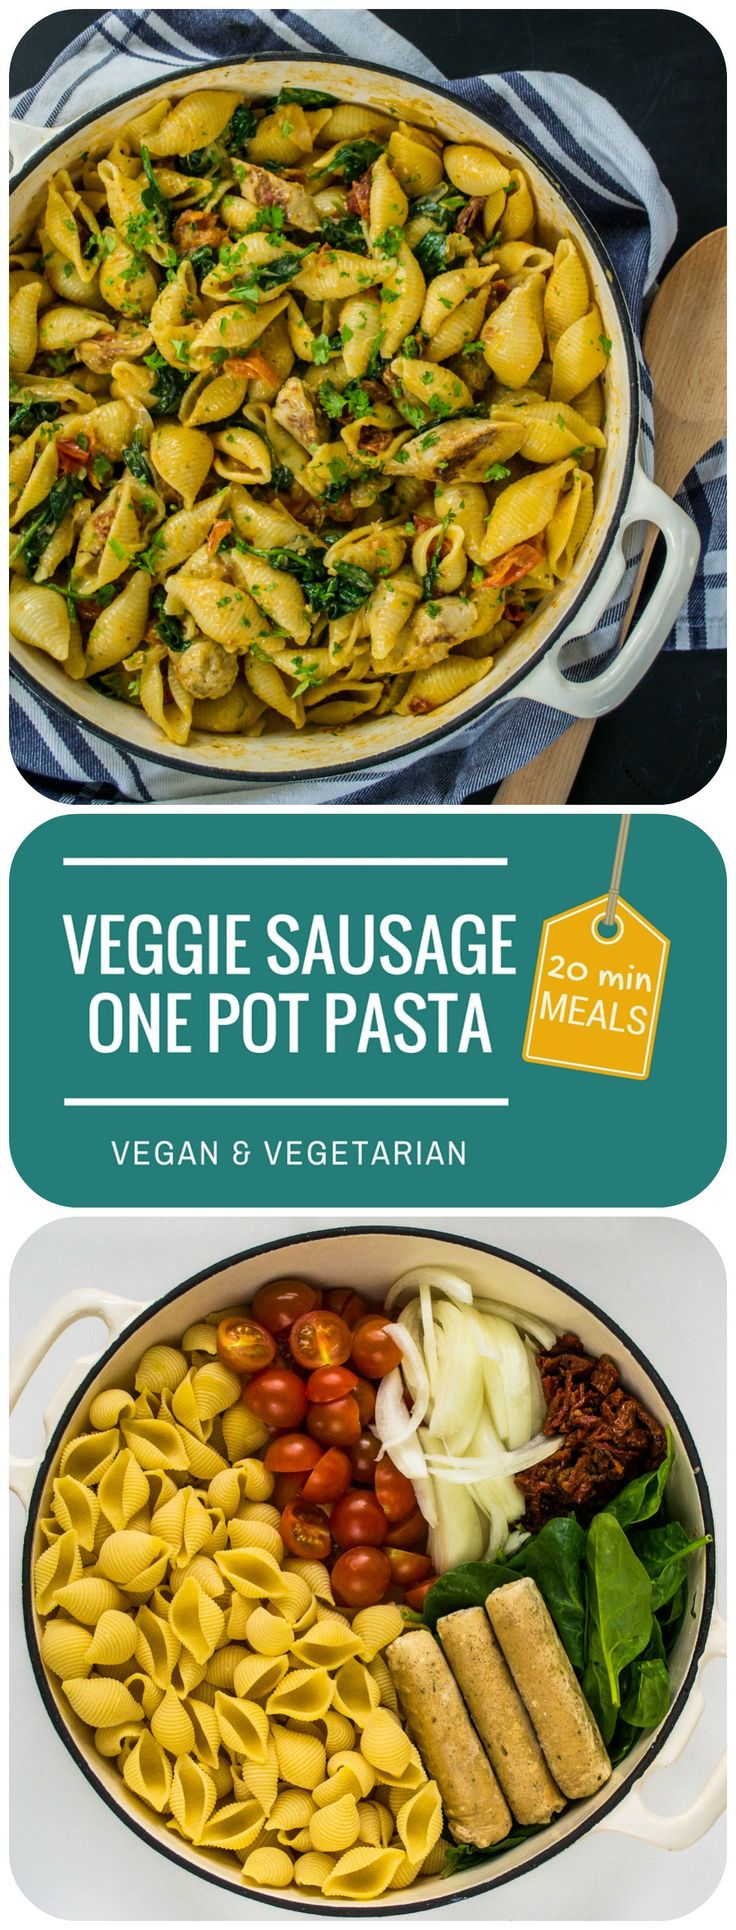 Veggie Sausage and Sun Dried Tomato One Pot Pasta   Vegetarian & Vegan